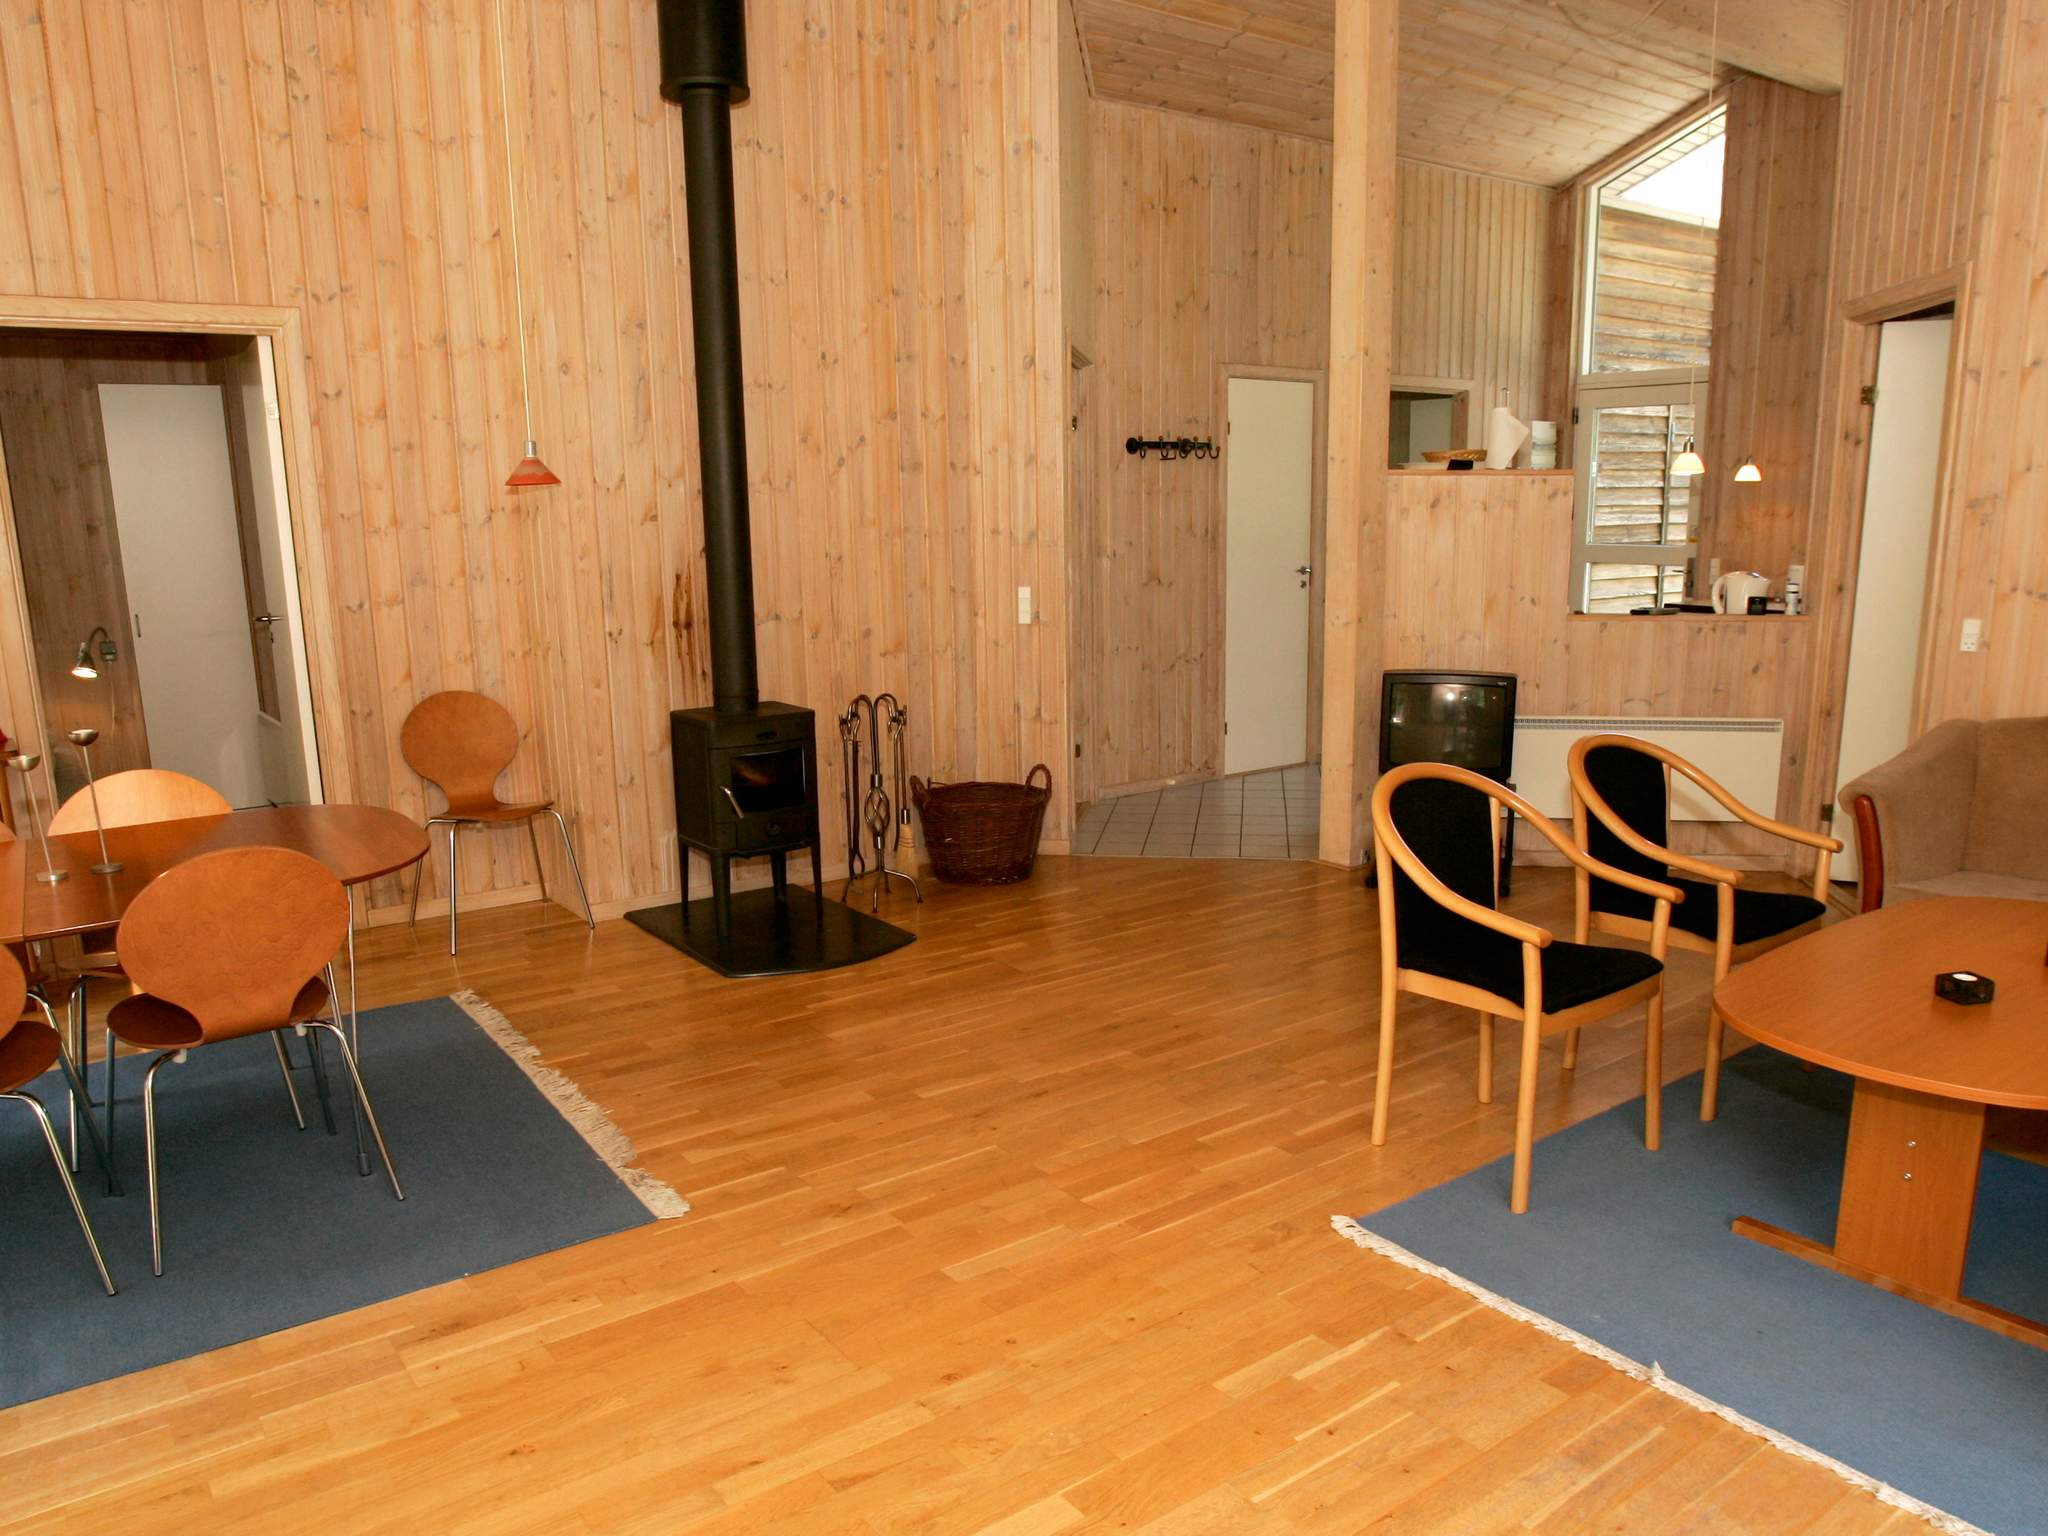 Ferienhaus Hasle (83419), Hasle, , Bornholm, Dänemark, Bild 4